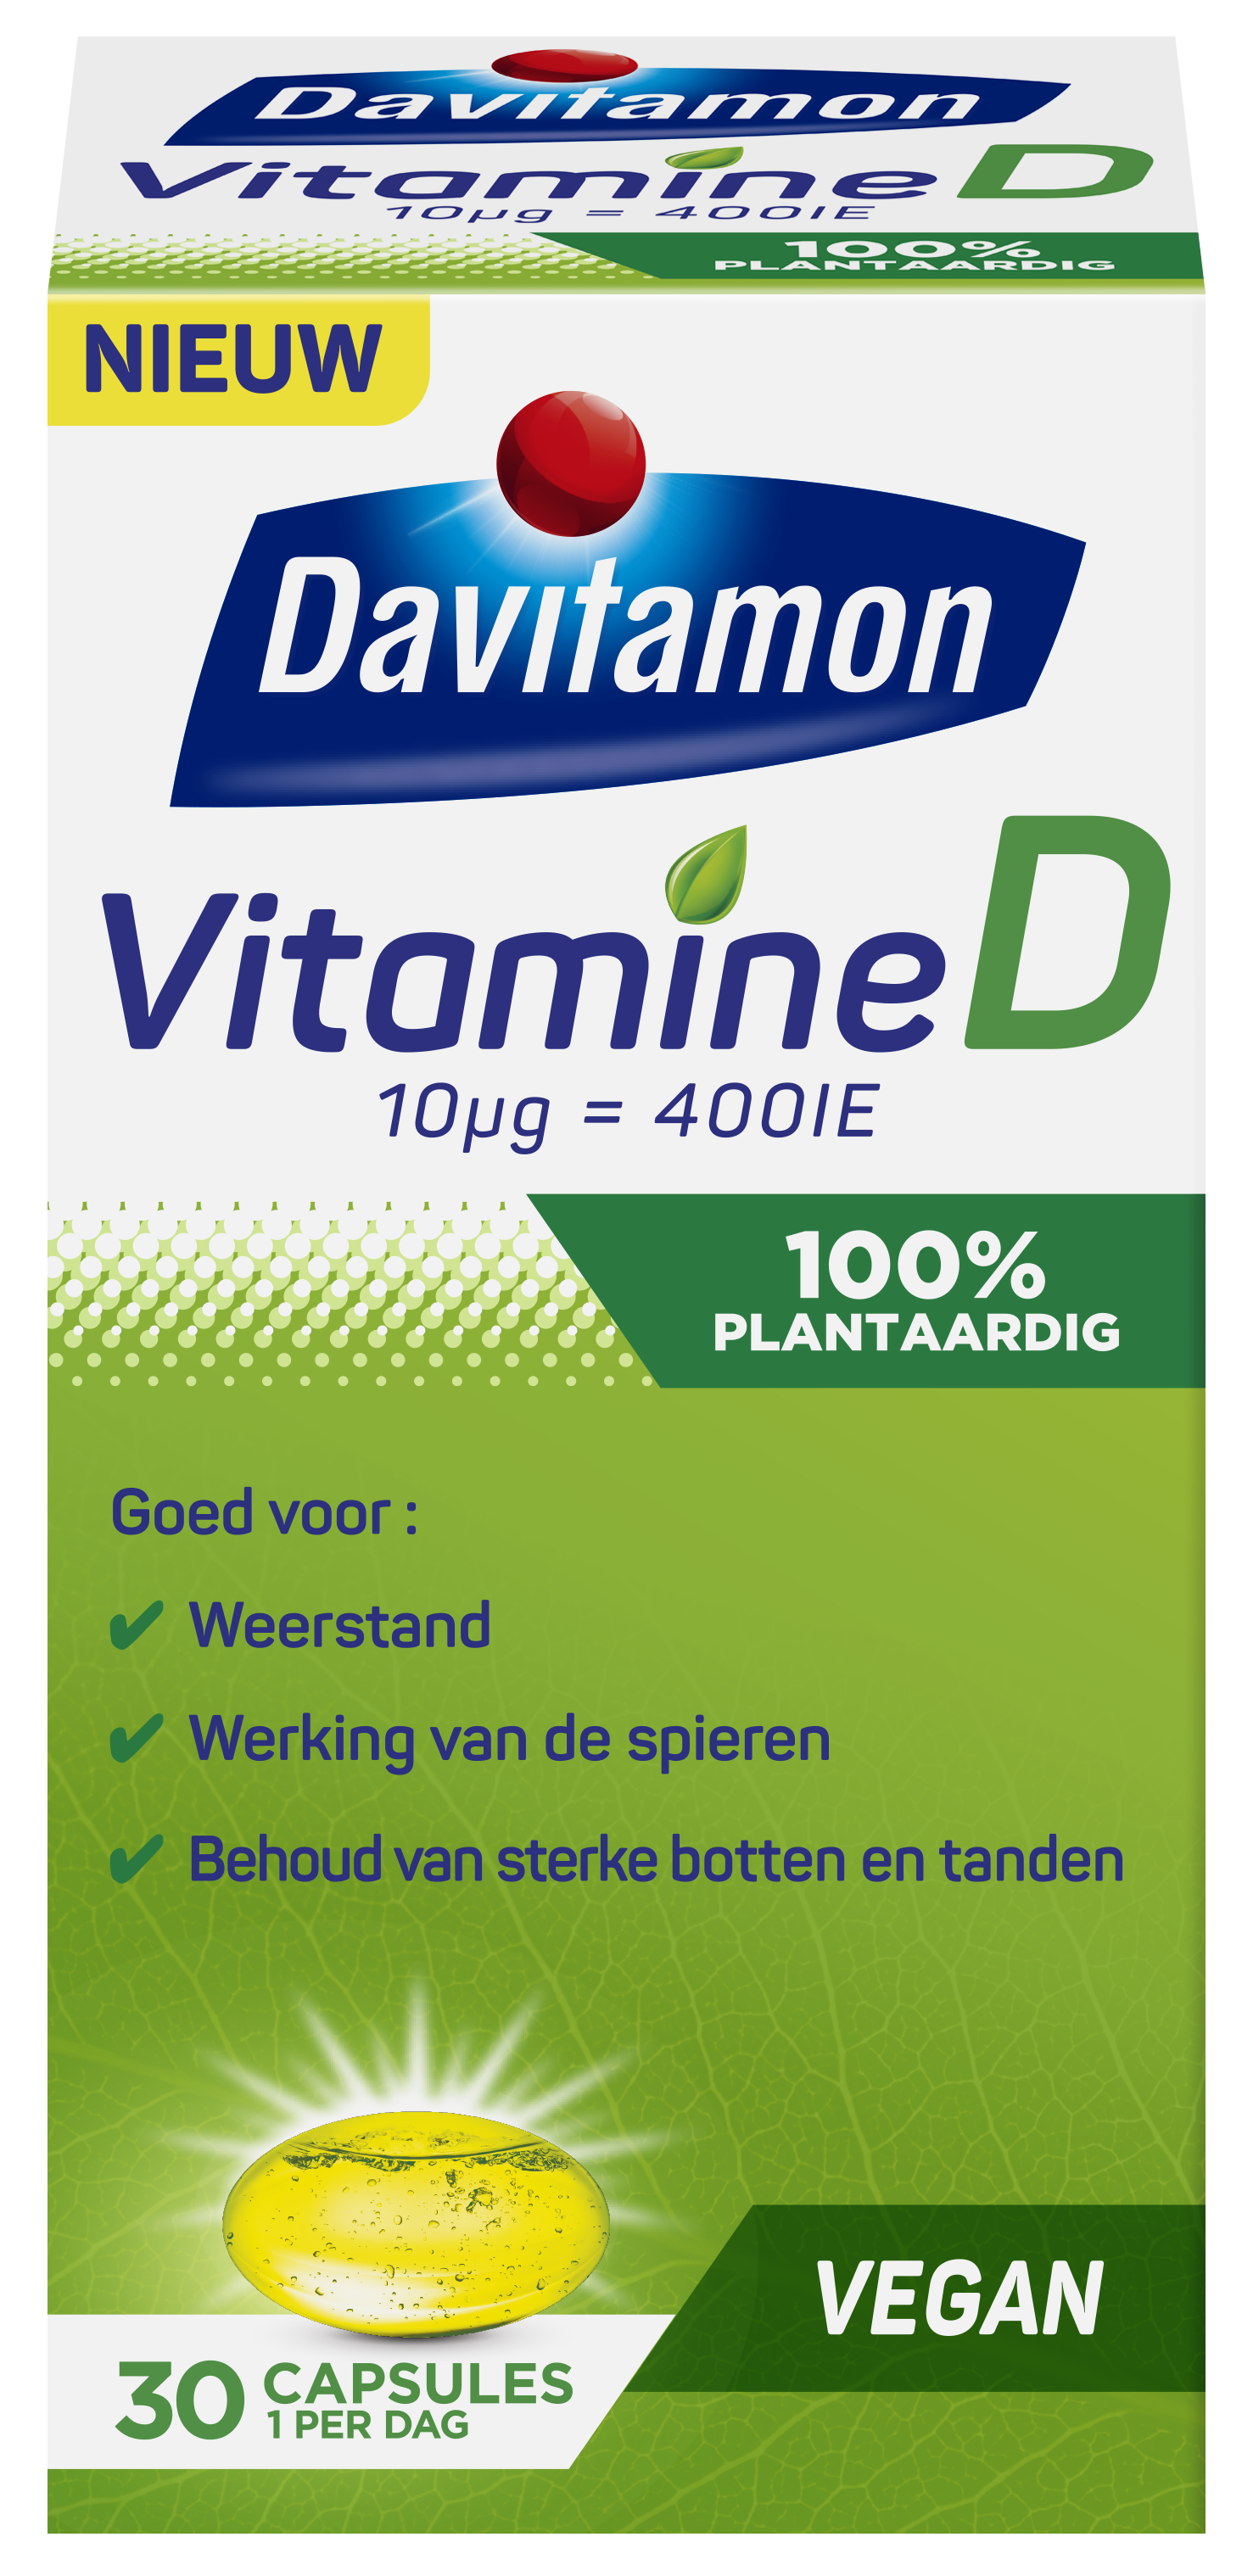 Davitamon Vitamine D 100% plantaardig – 1 per dag